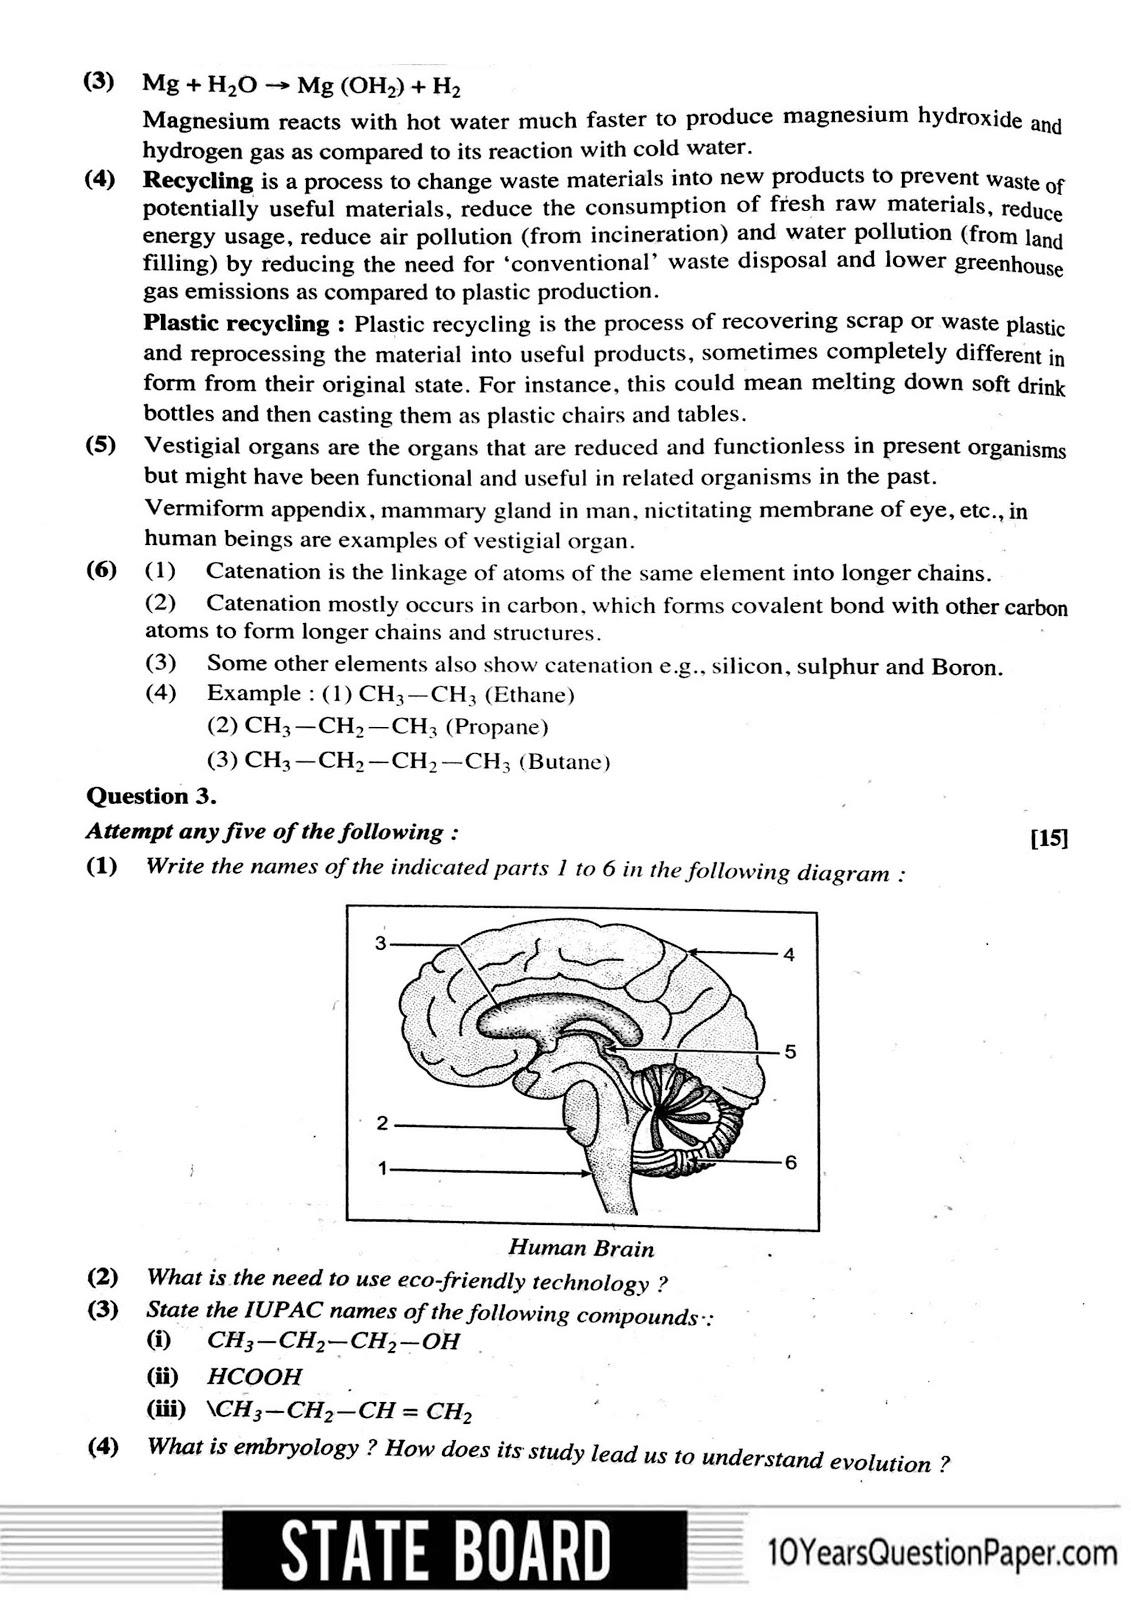 Science Diagrams Of Class 10 Hero Honda Splendor Bike Wiring Diagram Maharashtra Ssc Board : & Technology X (march 2017) - Years Question Paper